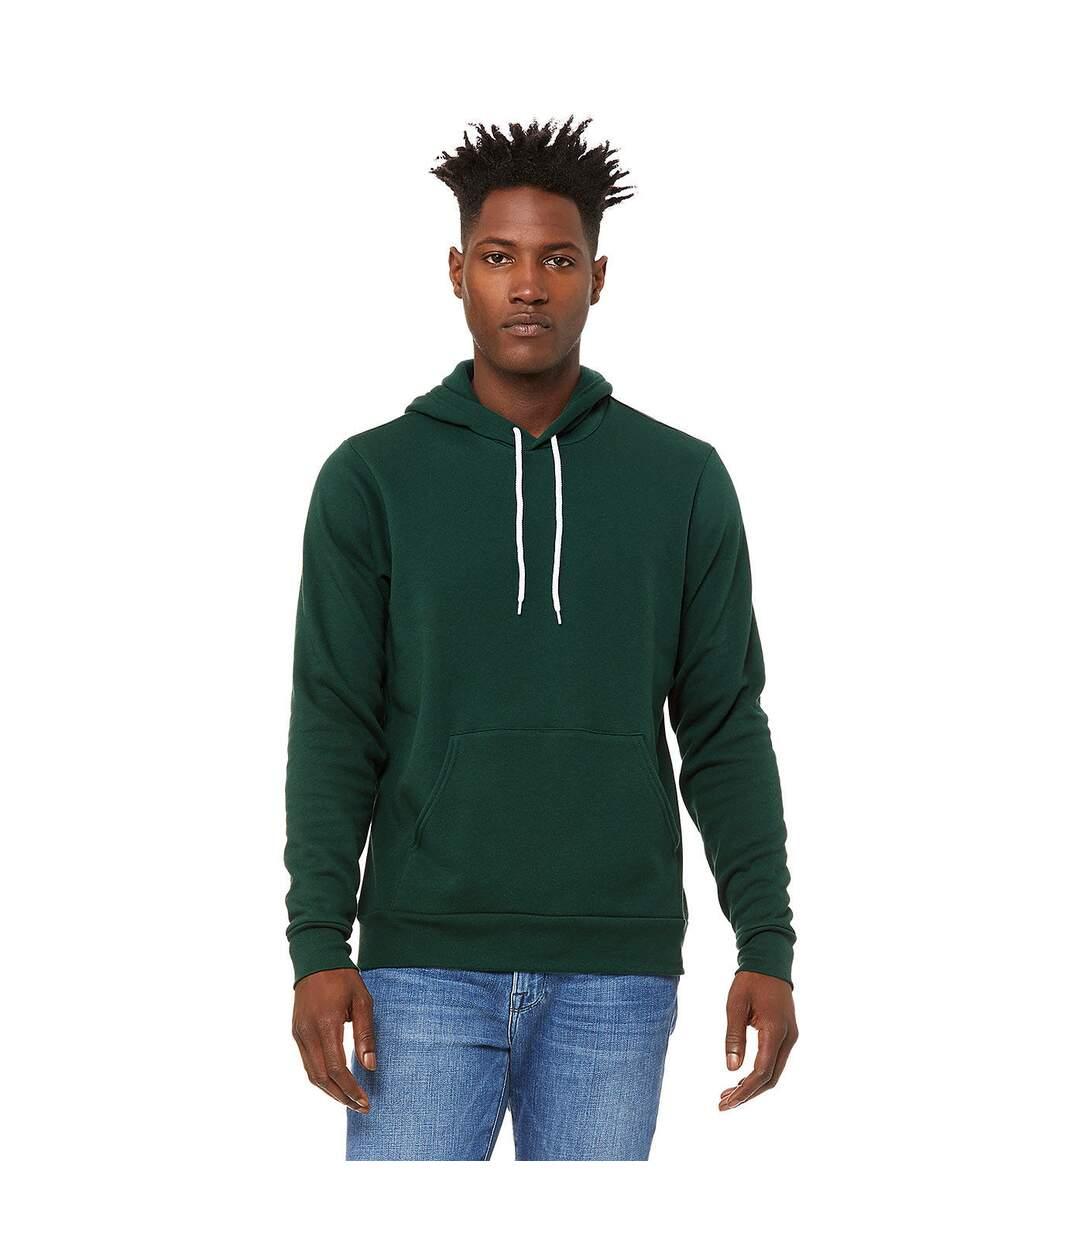 Bella + Canvas Unisex Pullover Polycotton Fleece Hooded Sweatshirt / Hoodie (White) - UTBC1336